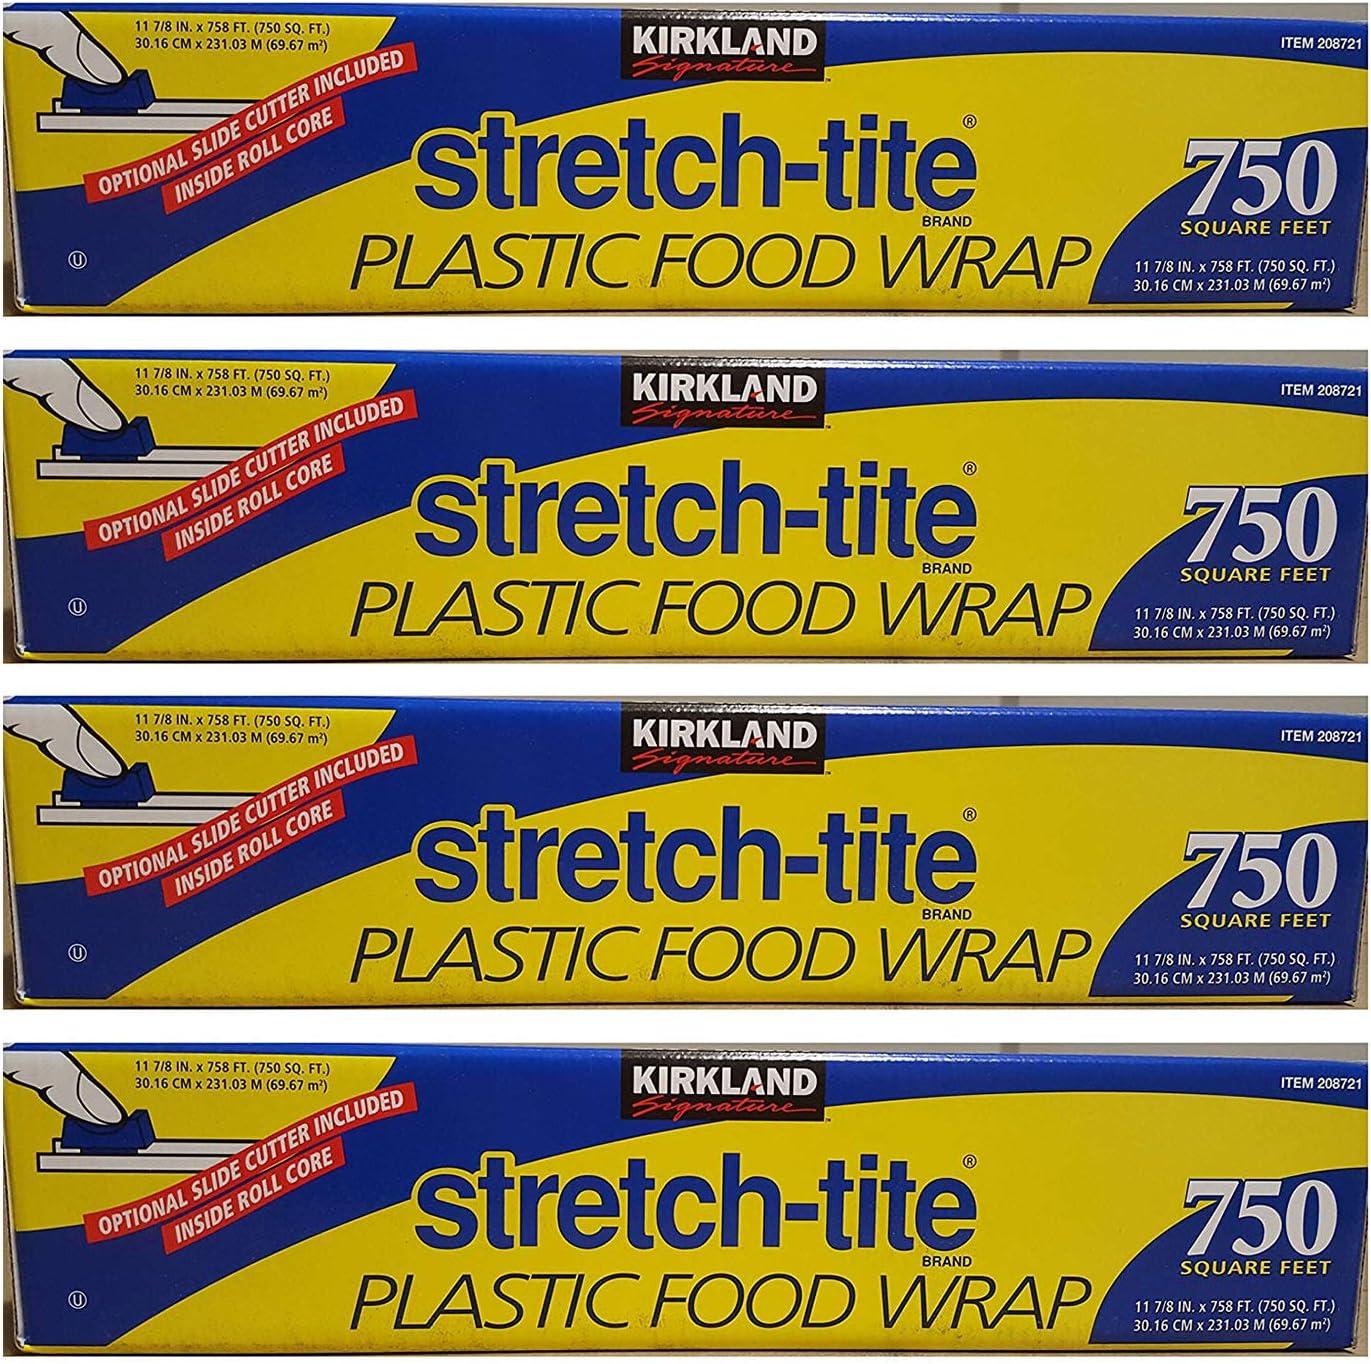 Kirkland Signature Stretch Tite Plastic Food Wrap 11 7/8 Inch X 750 SQ. FT. Pack 4